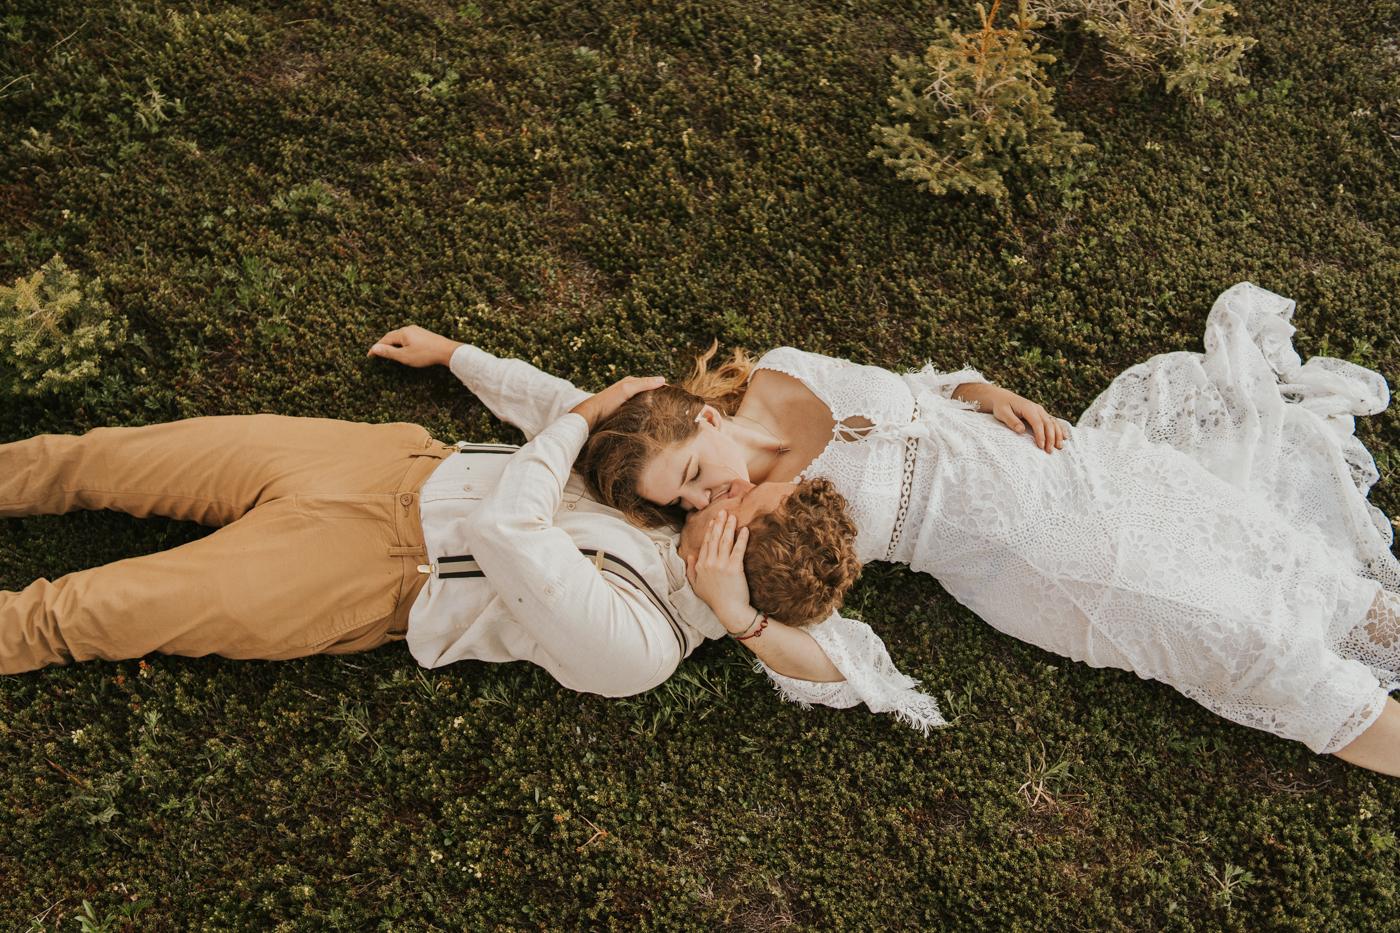 tyraephotography_photographer_wedding_elopement_engagement_photography-08156.jpg